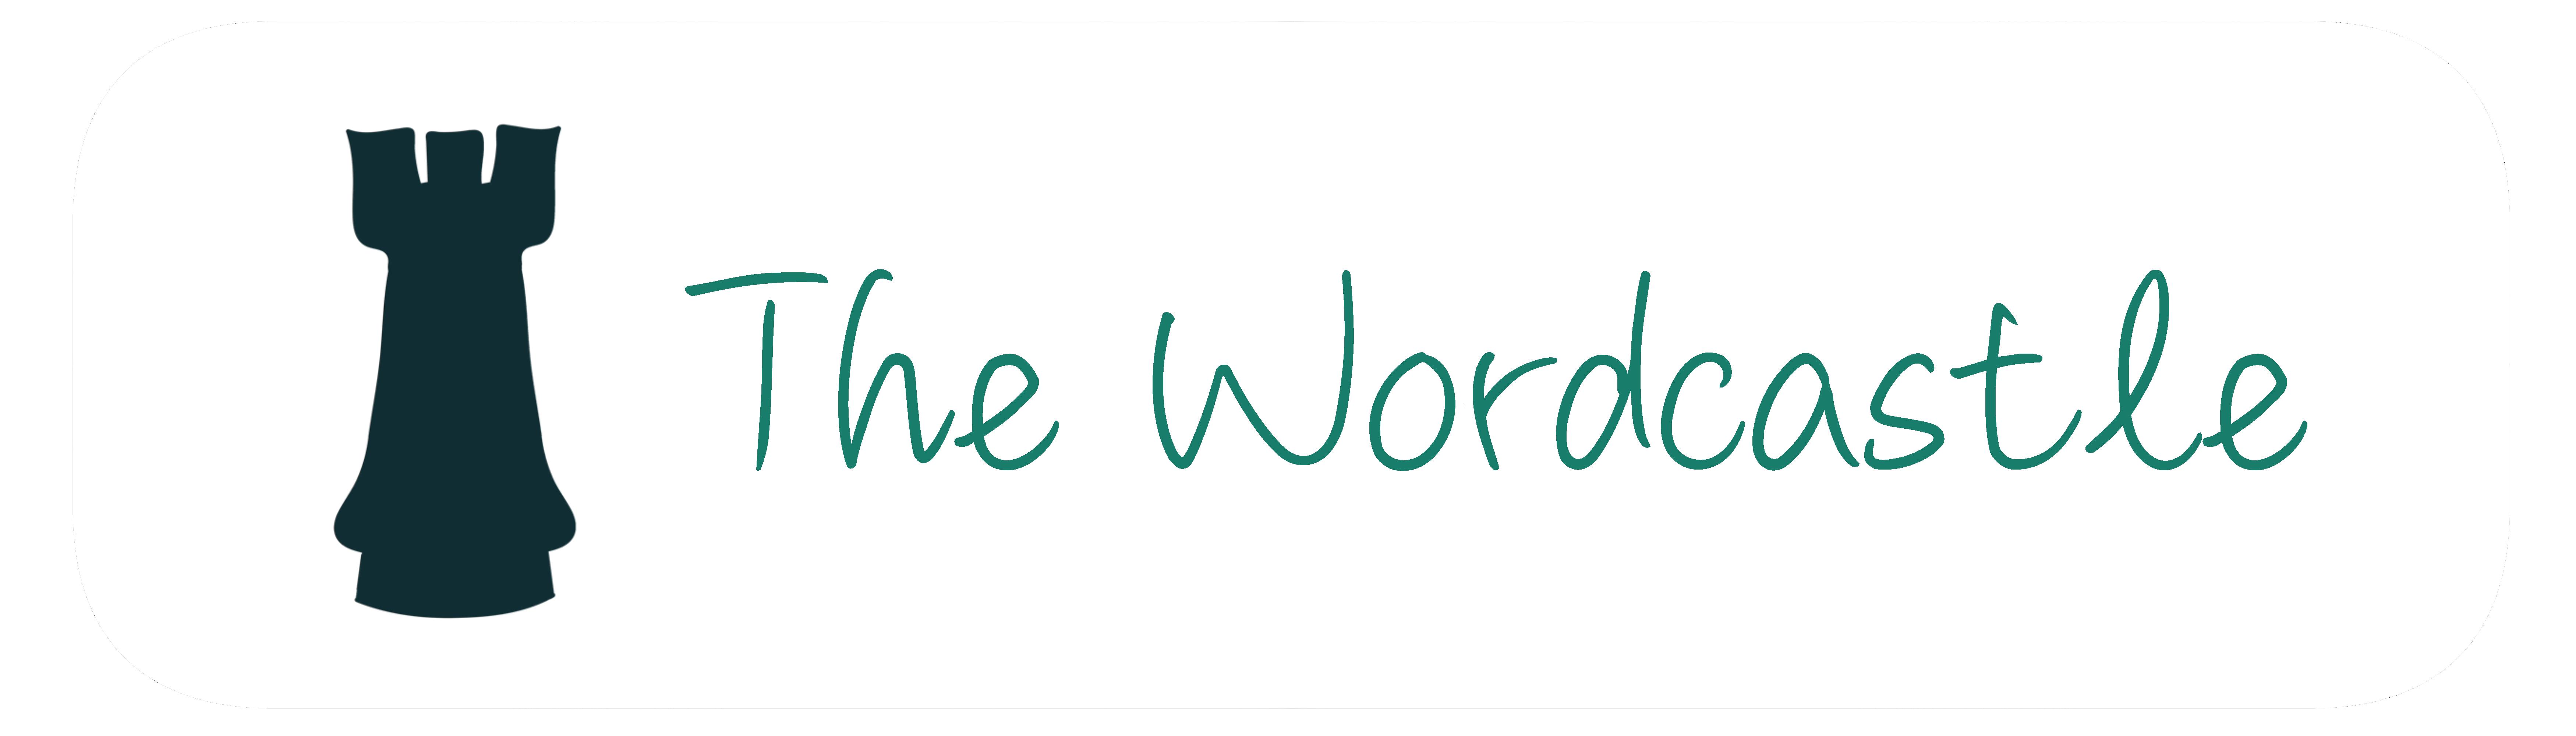 The Wordcastle